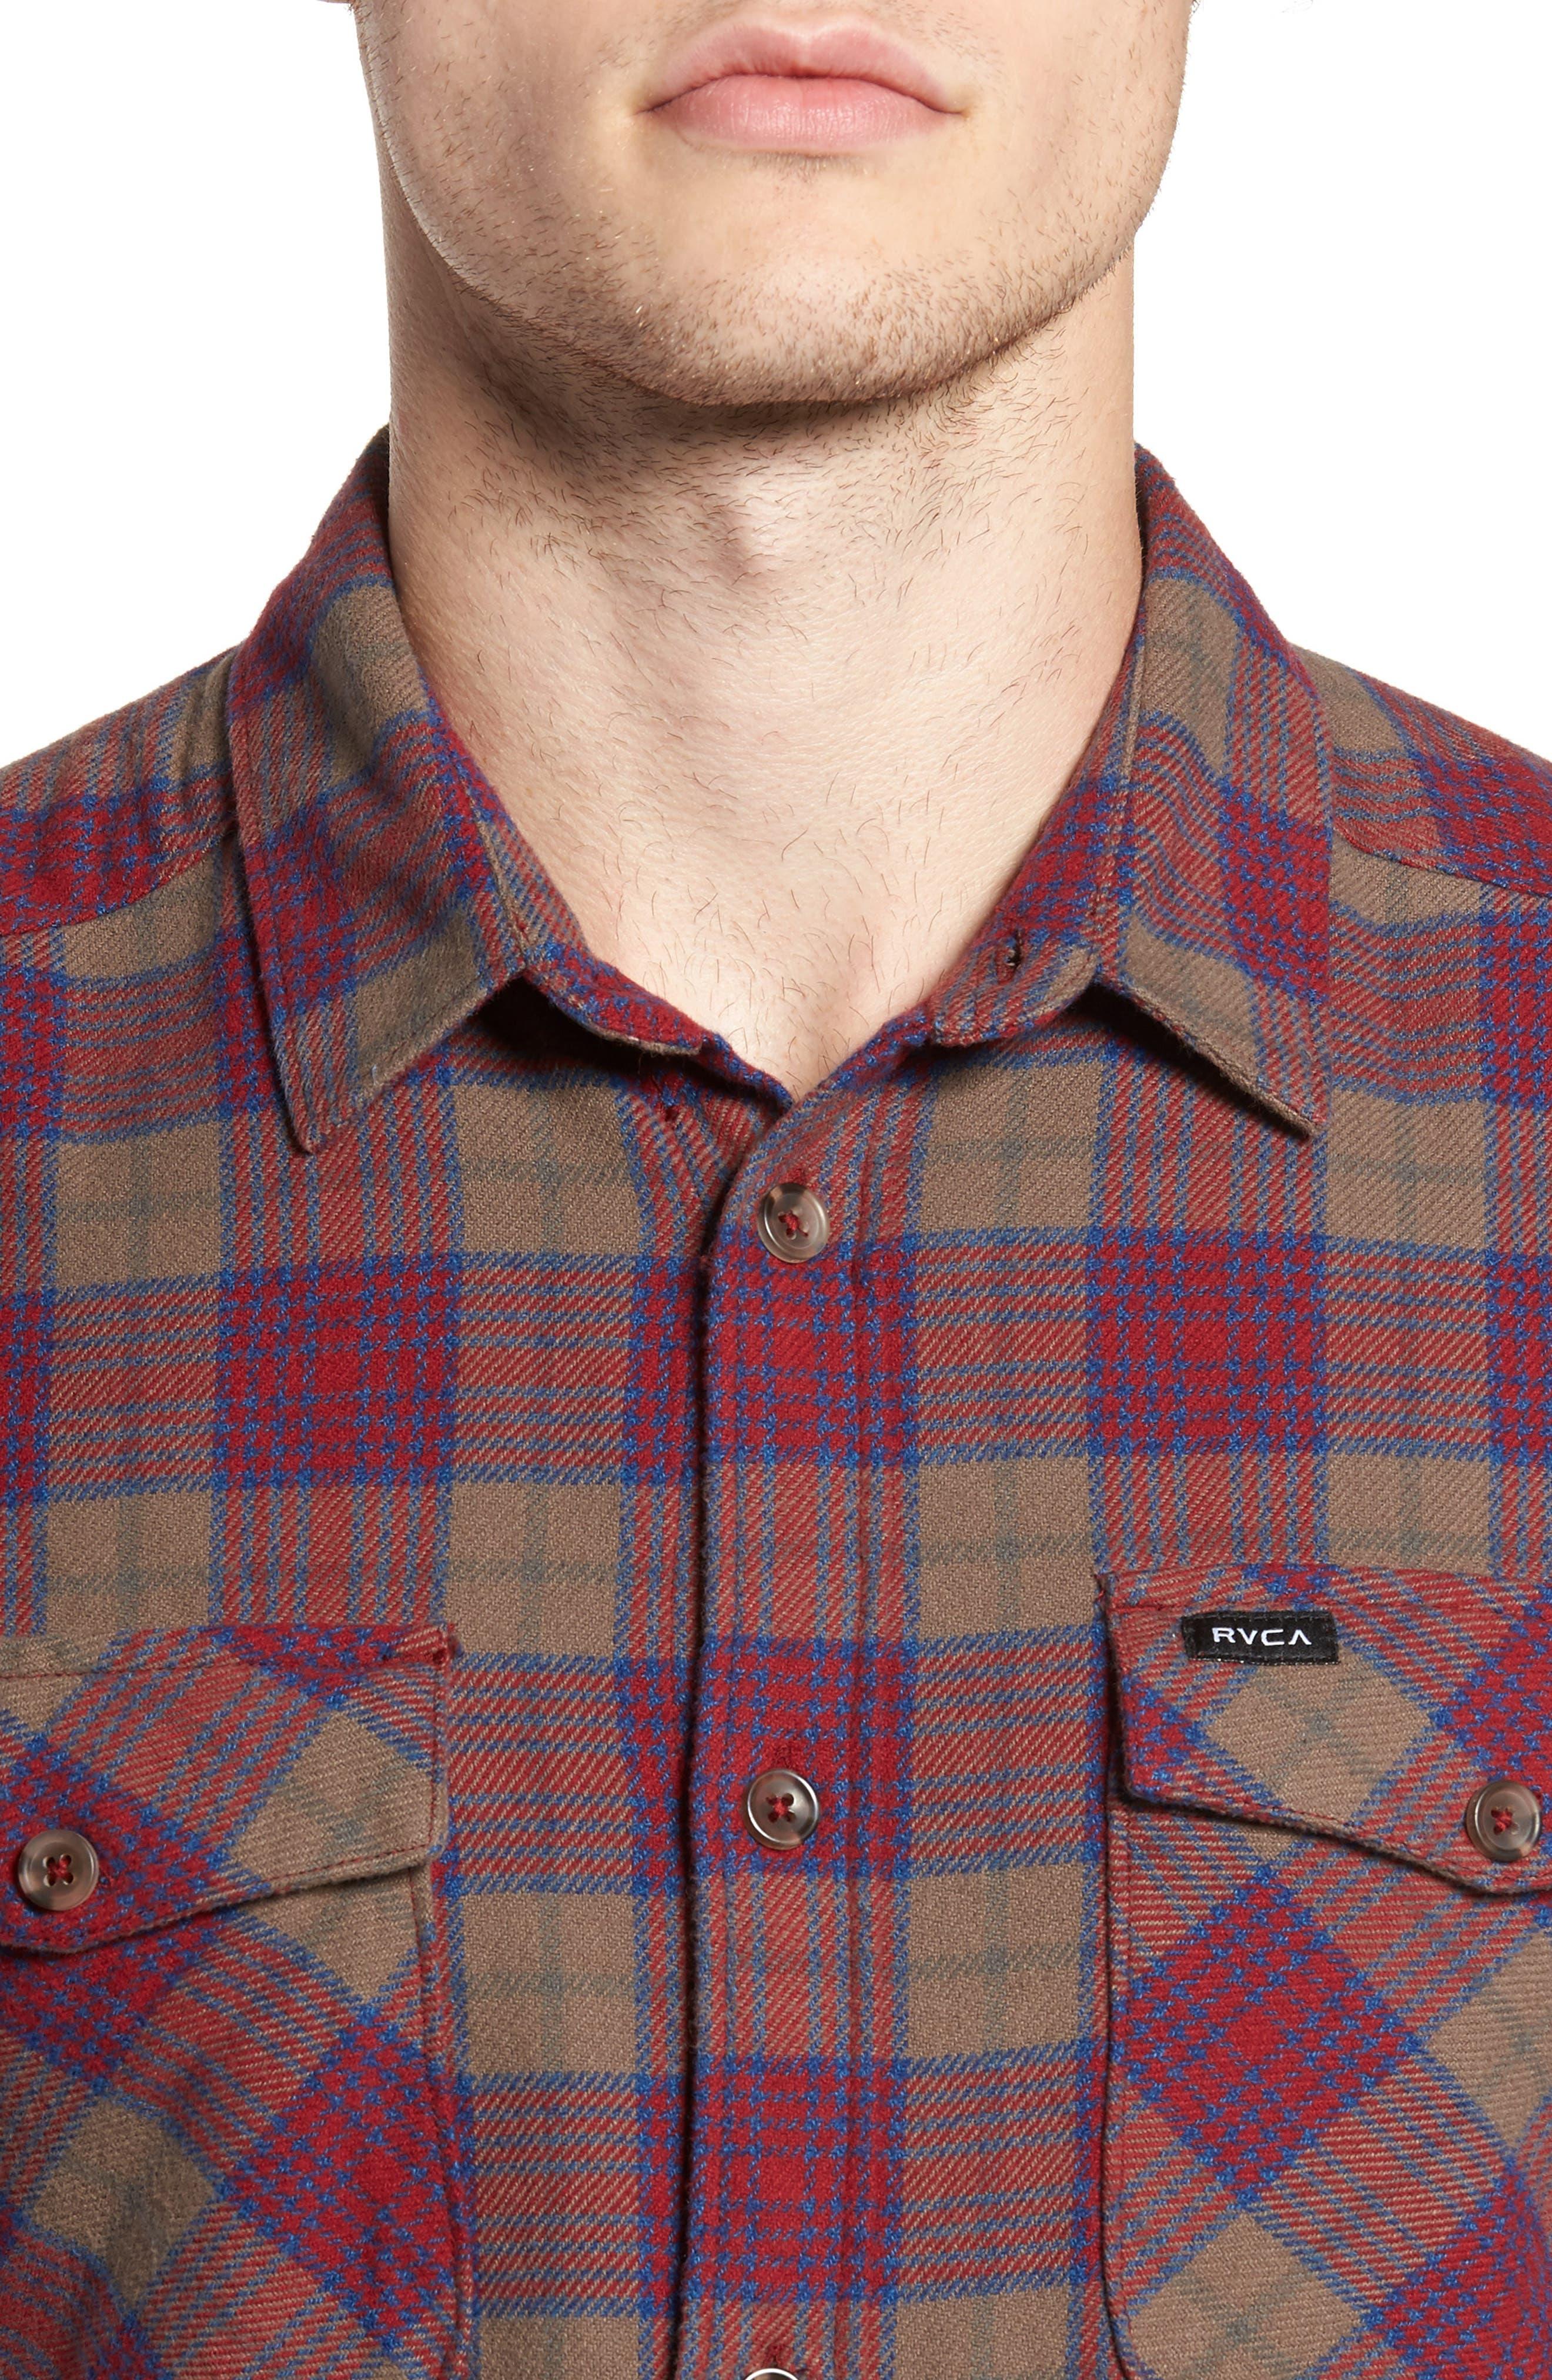 'That'll Work' Trim Fit Plaid Flannel Shirt,                             Alternate thumbnail 19, color,